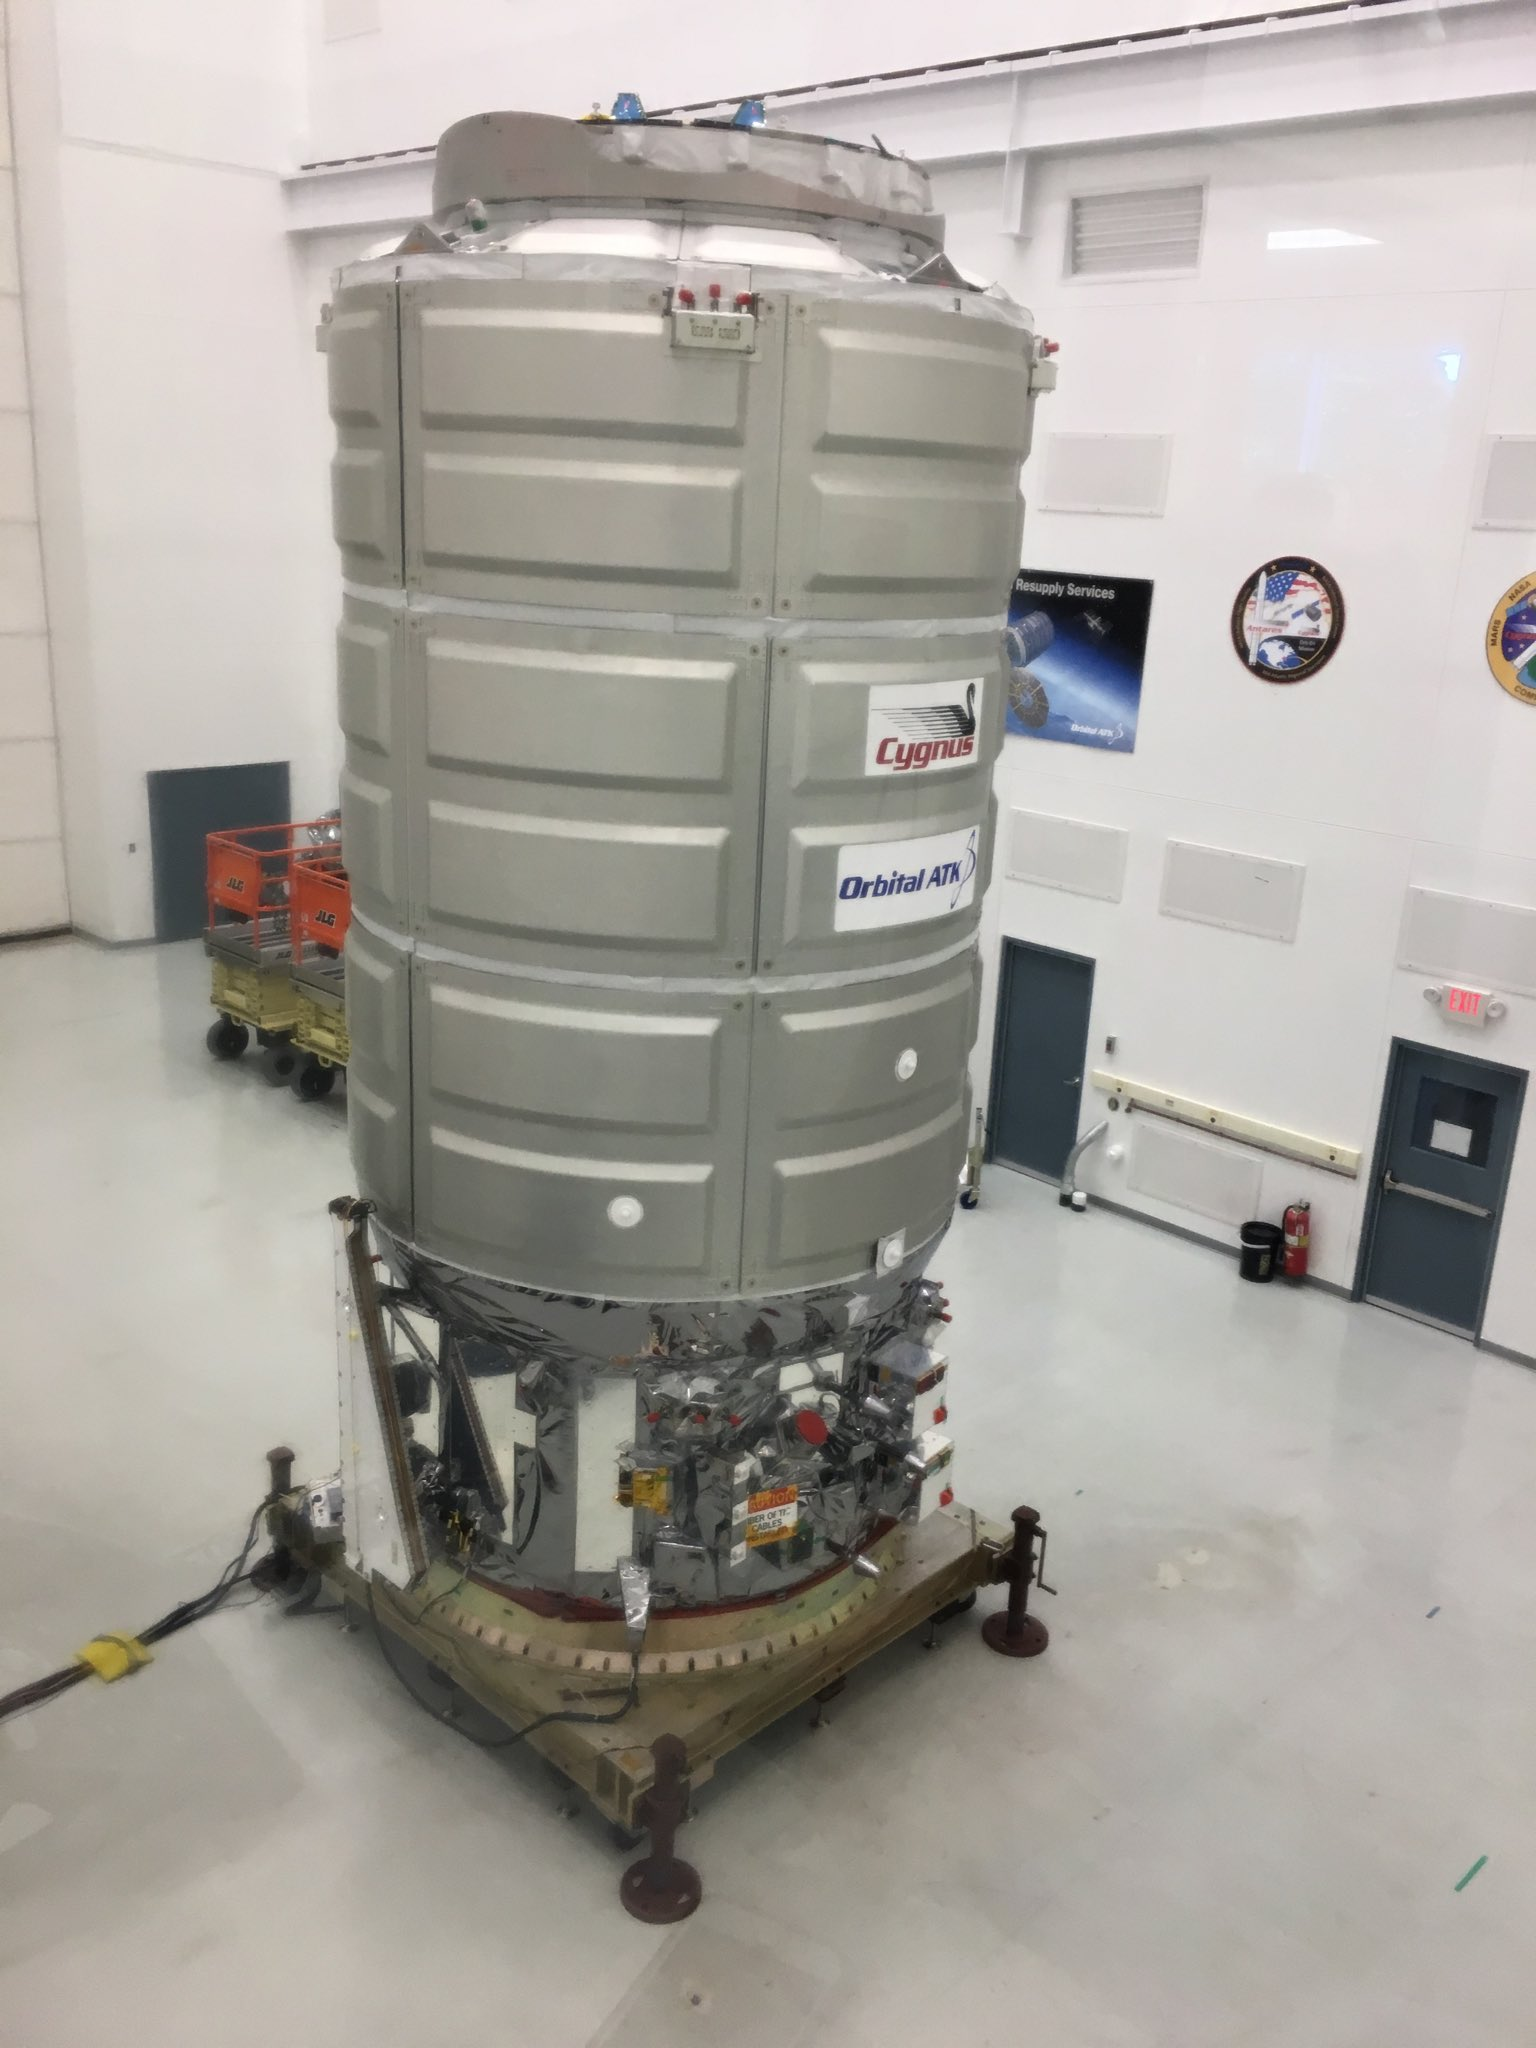 The Orbital ATK Cygnus OA 8 vehicle ready for launch in Nov. https://t.co/VvNtdARi7v